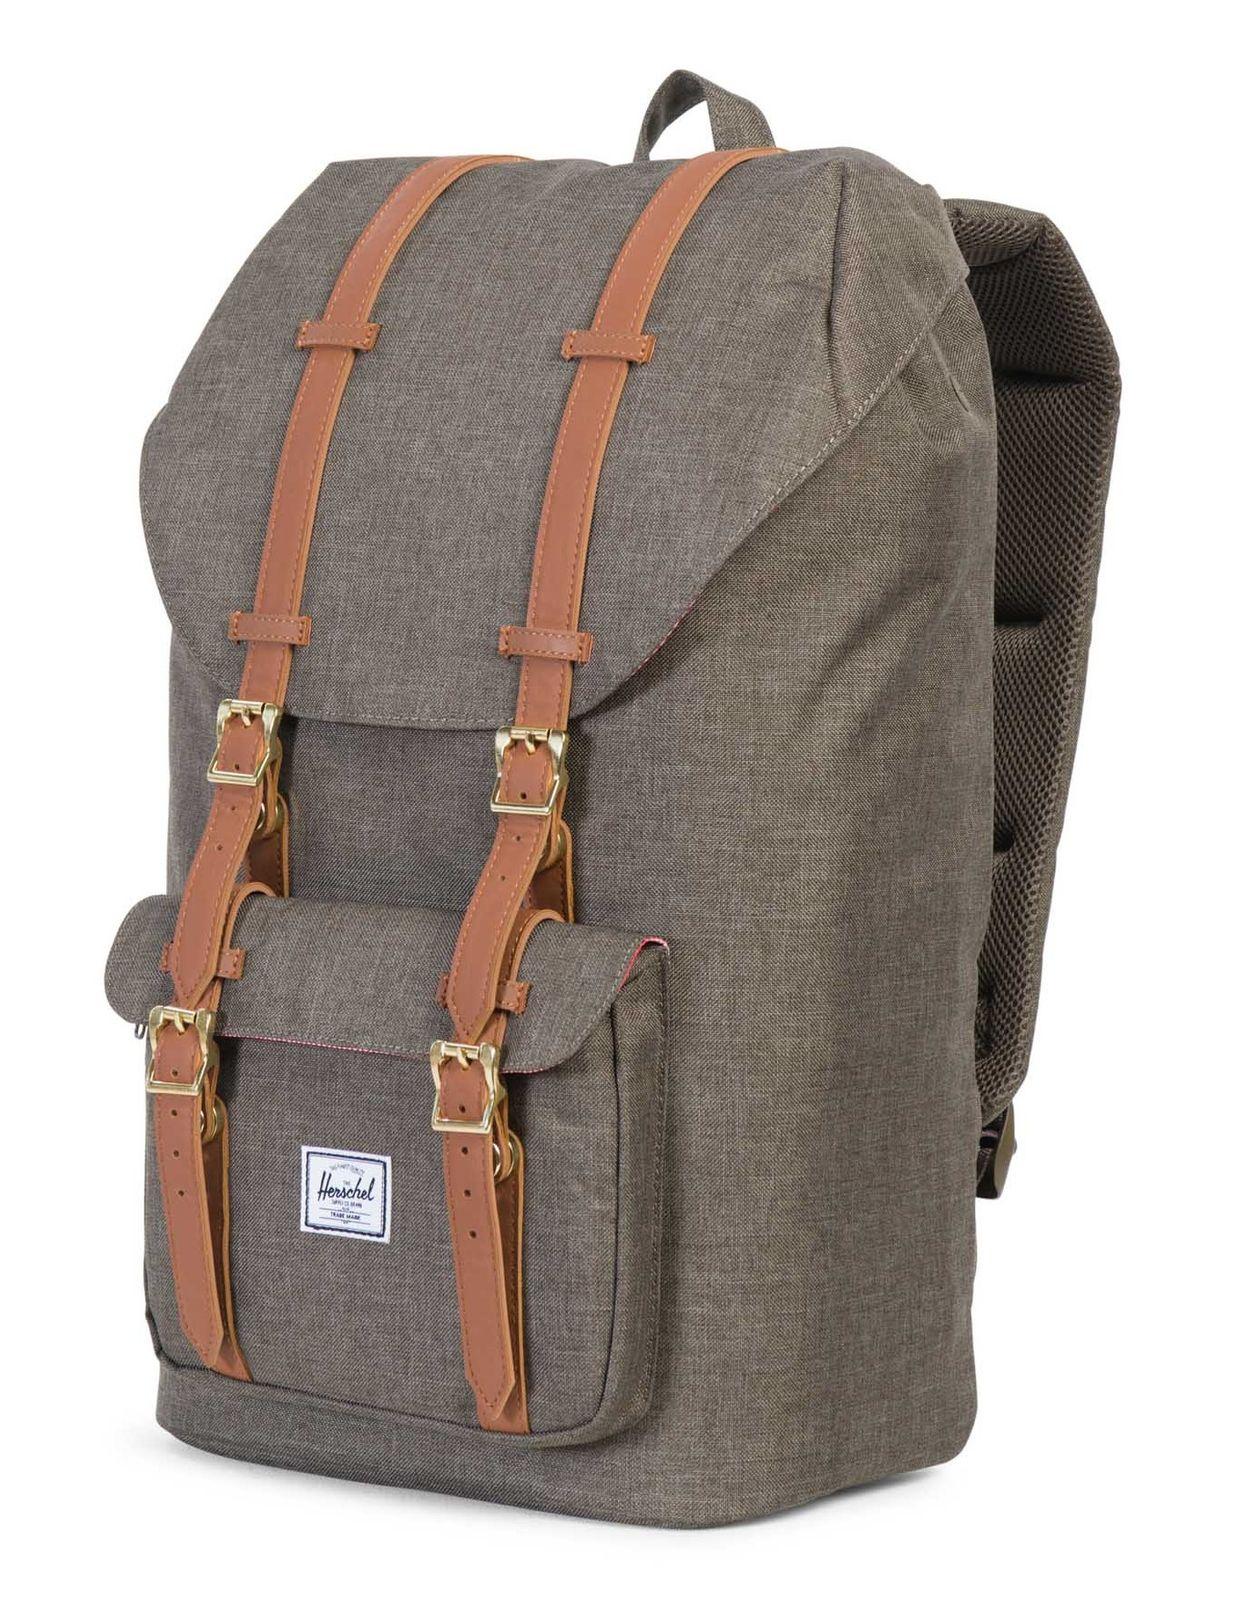 herschel little america backpack rucksack freizeitrucksack gr n braun neu ebay. Black Bedroom Furniture Sets. Home Design Ideas